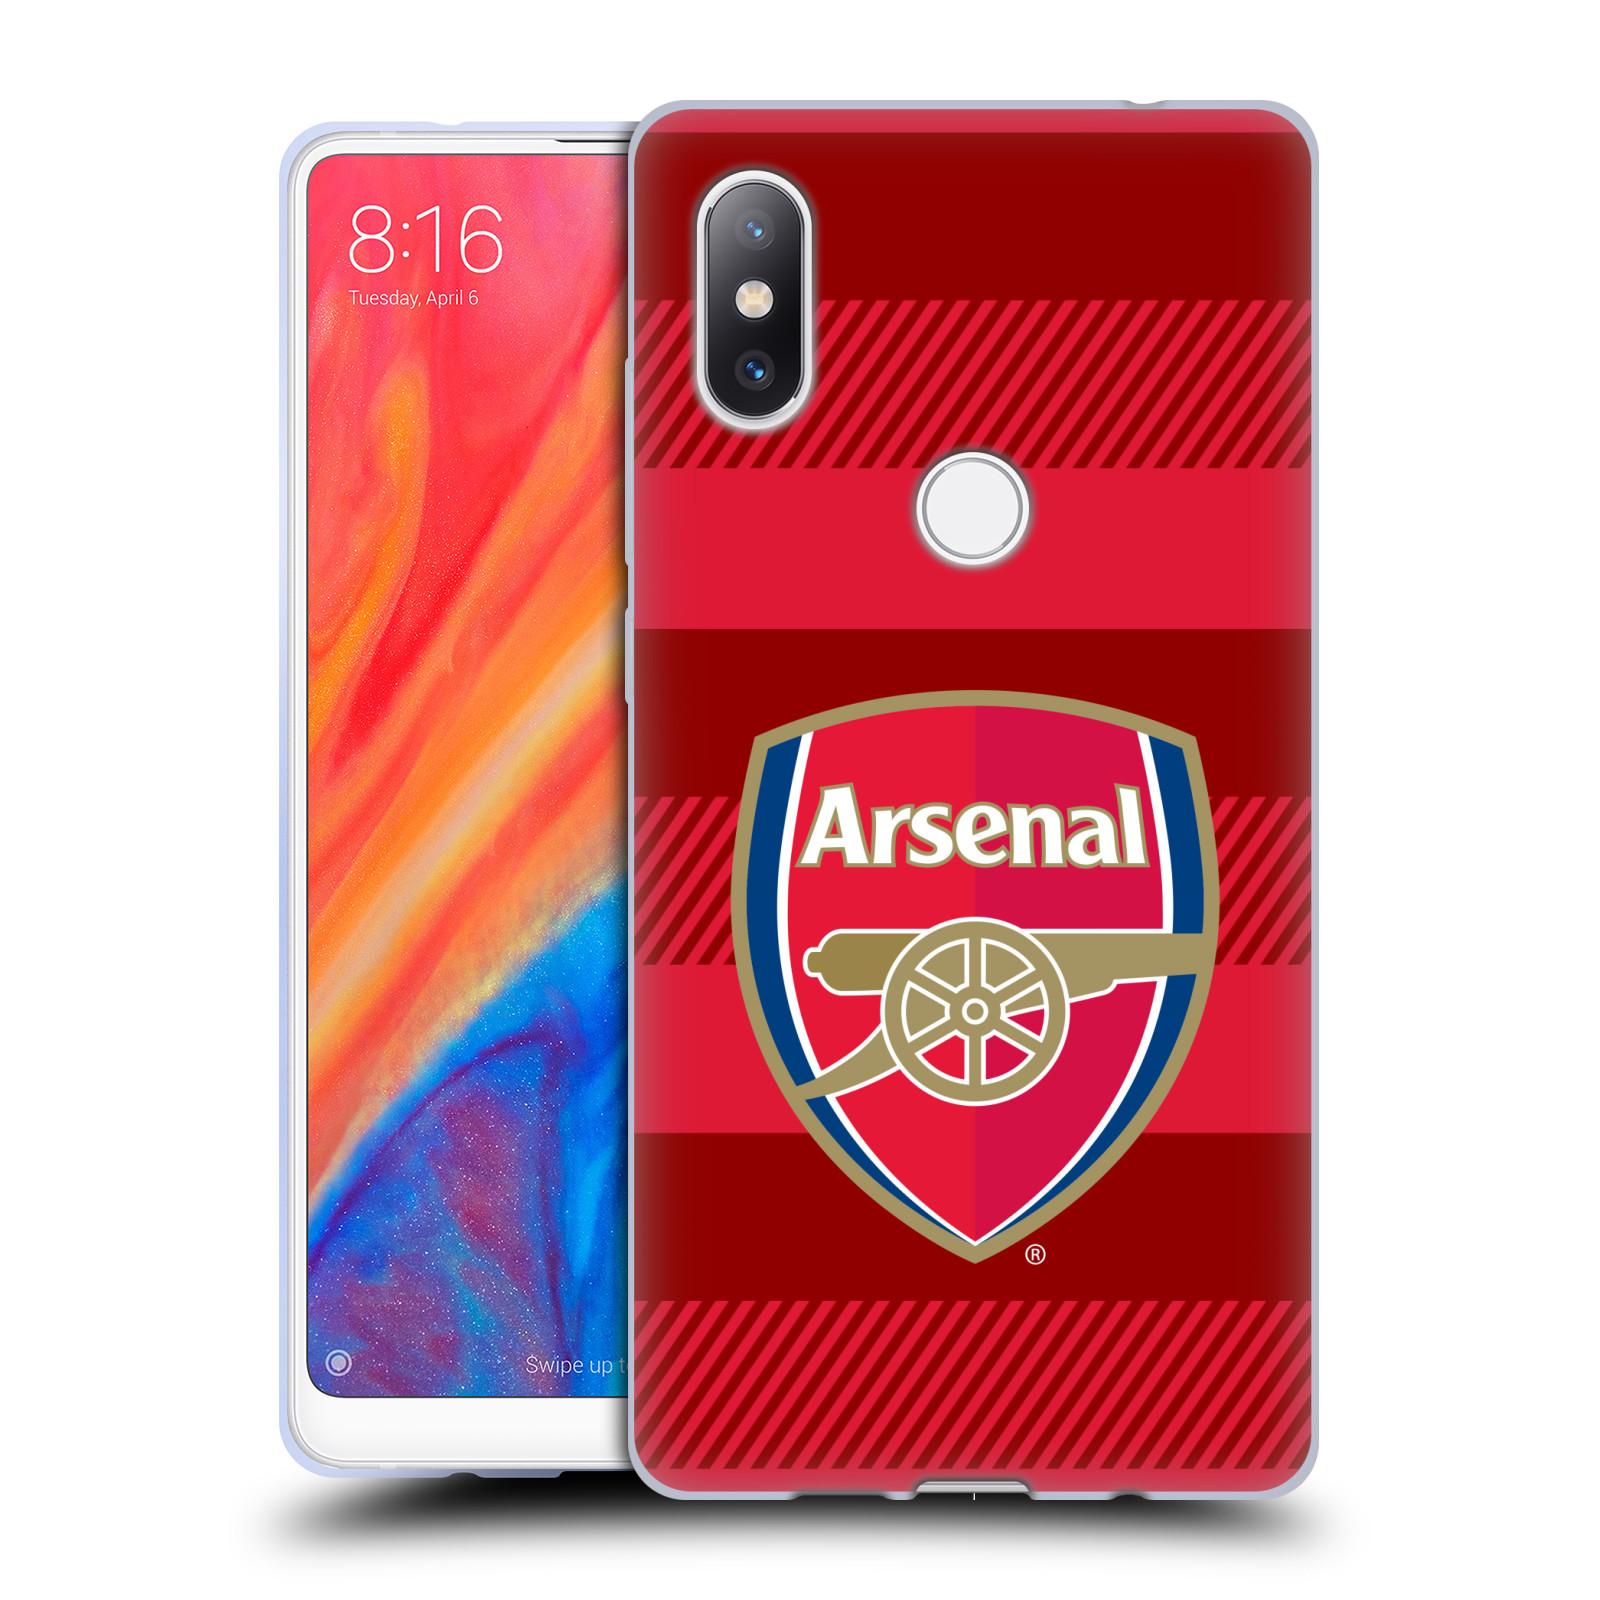 Silikonové pouzdro na mobil Xiaomi Mi Mix 2S - Head Case - Arsenal FC - Logo s pruhy